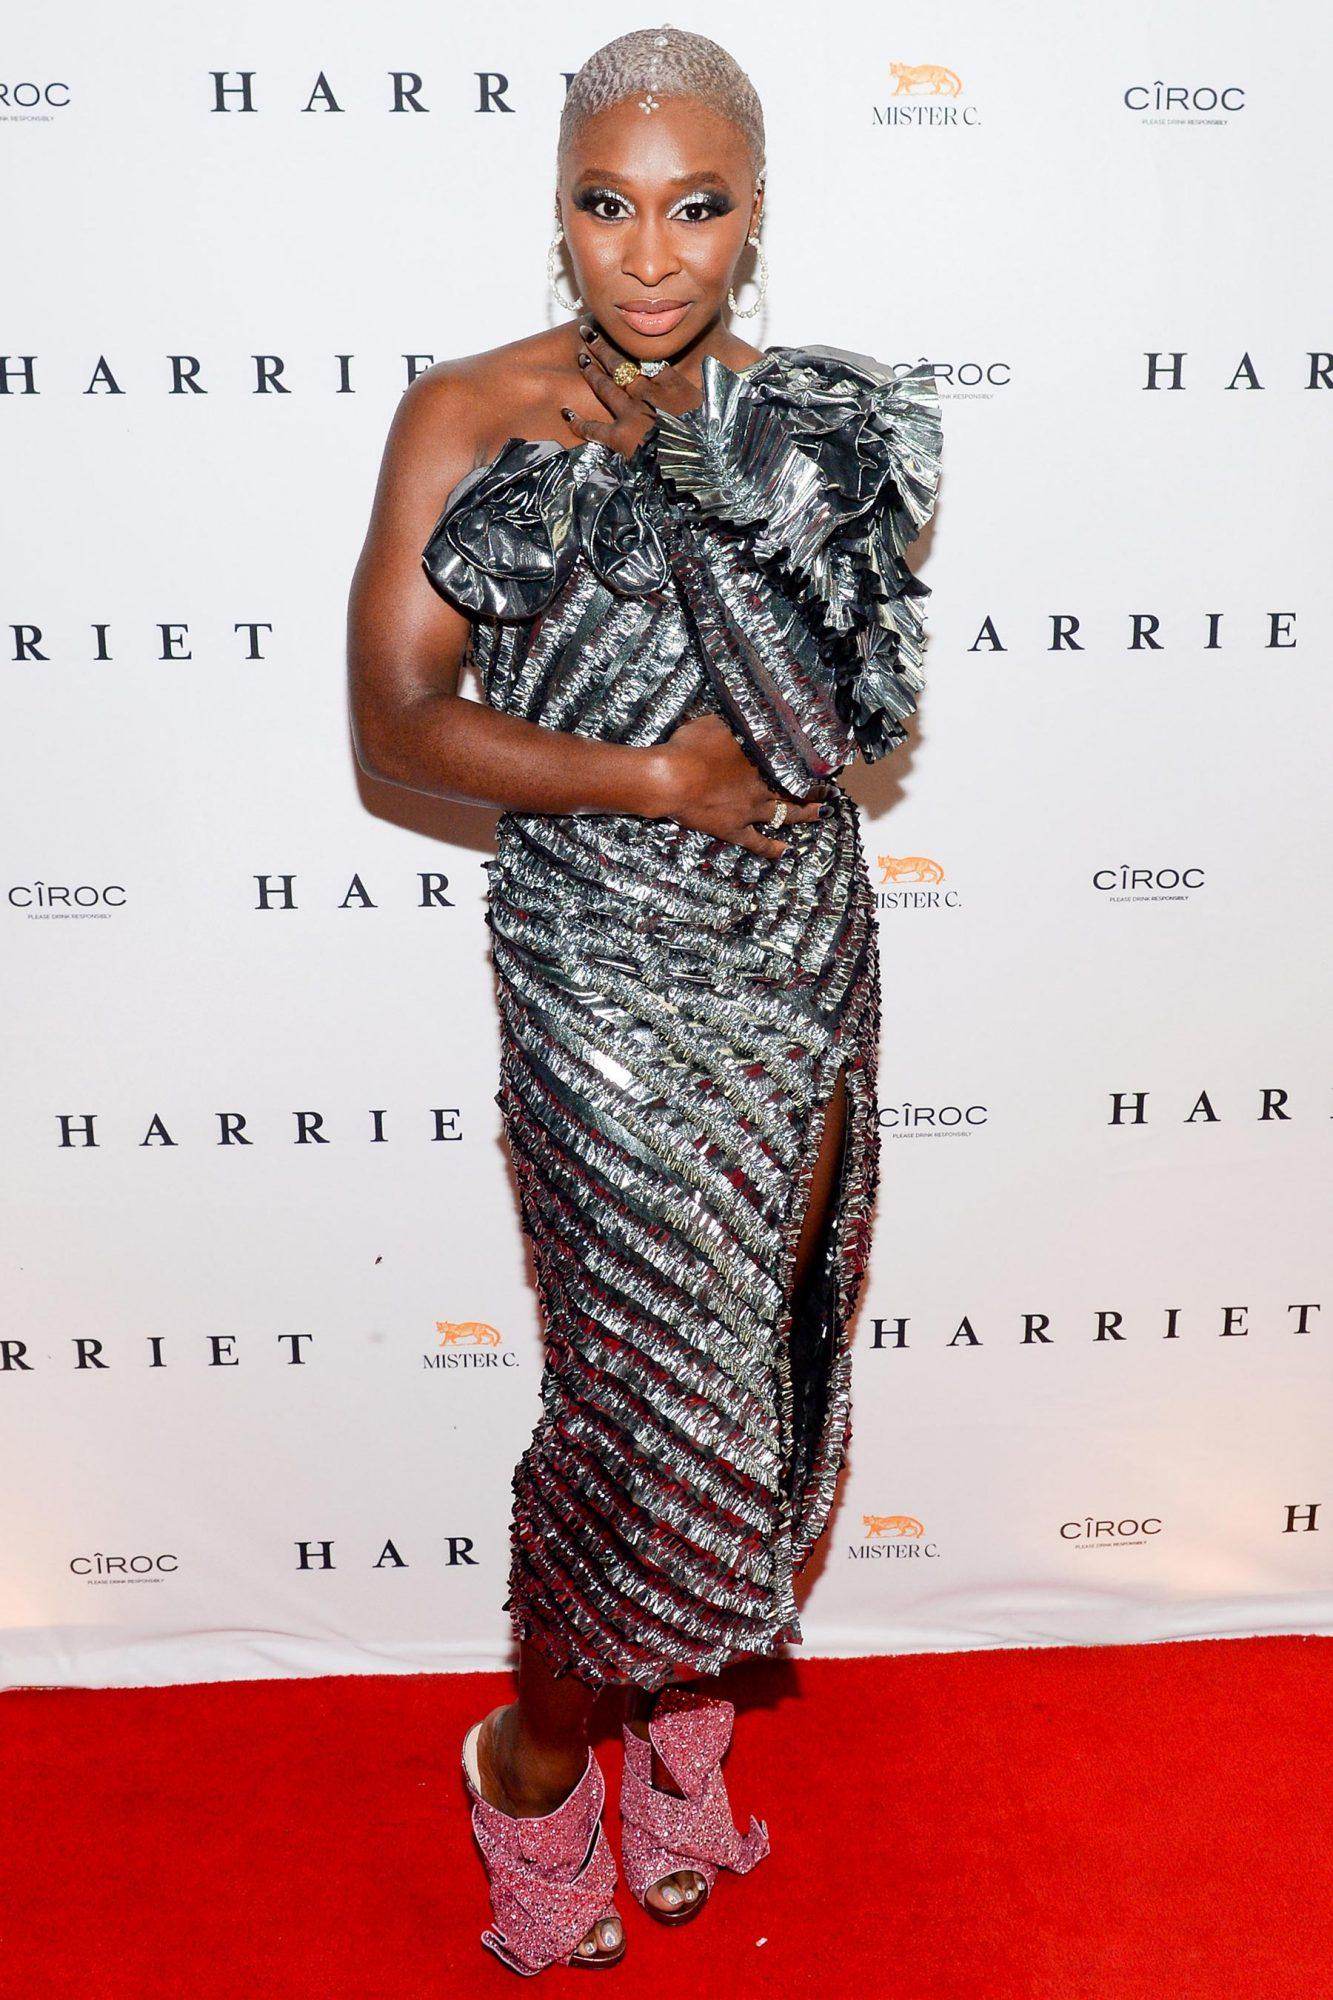 """Harriet"" World Premiere Party Hosted By CÎROC Vodka"